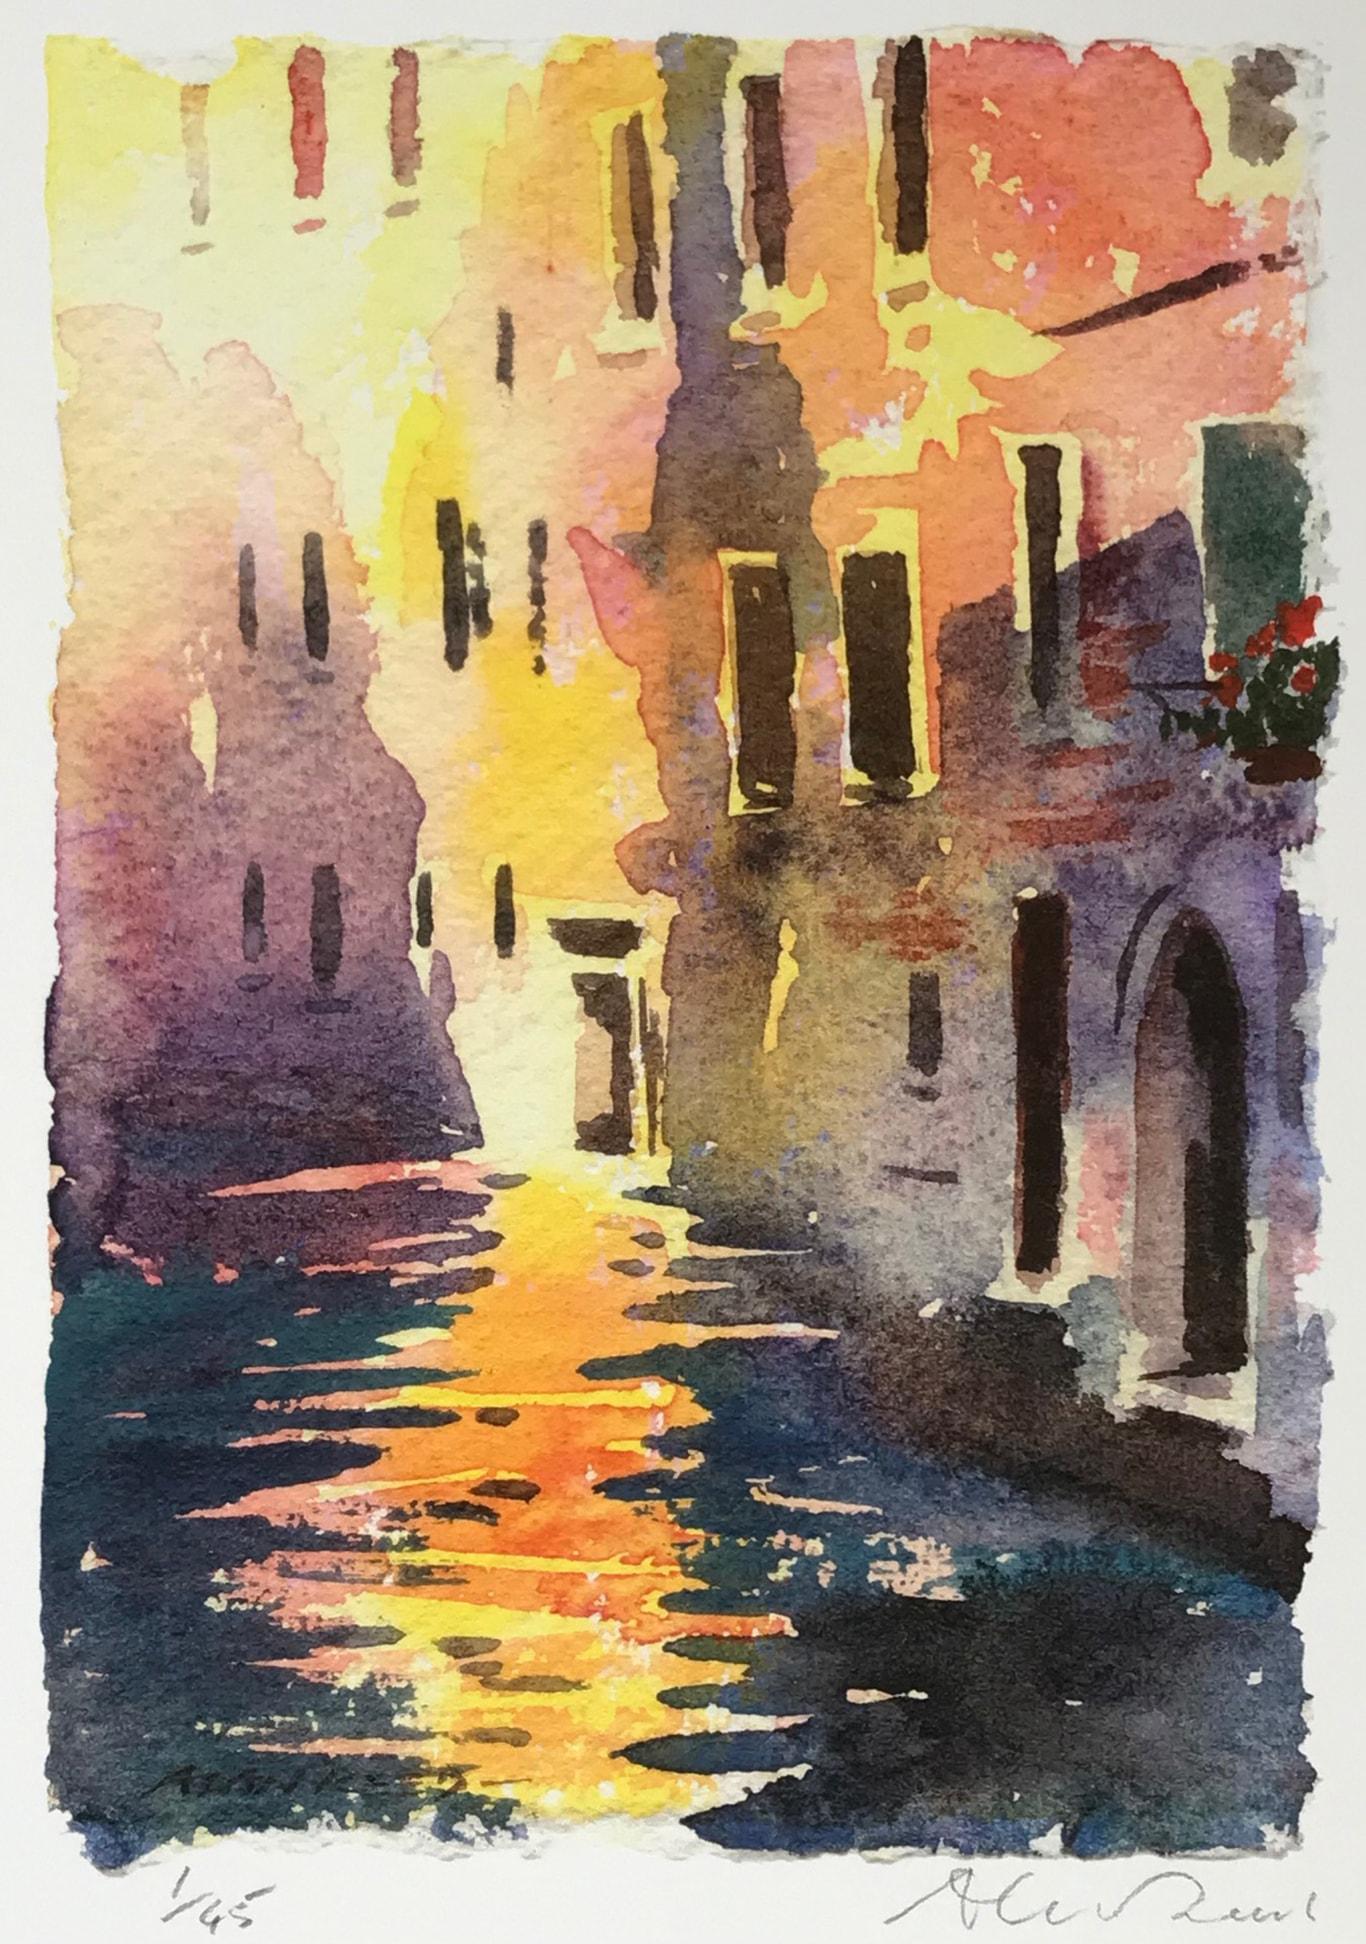 Sunlight in Venice Printhttps://alanreed.com/product/sunlight-in-venice/